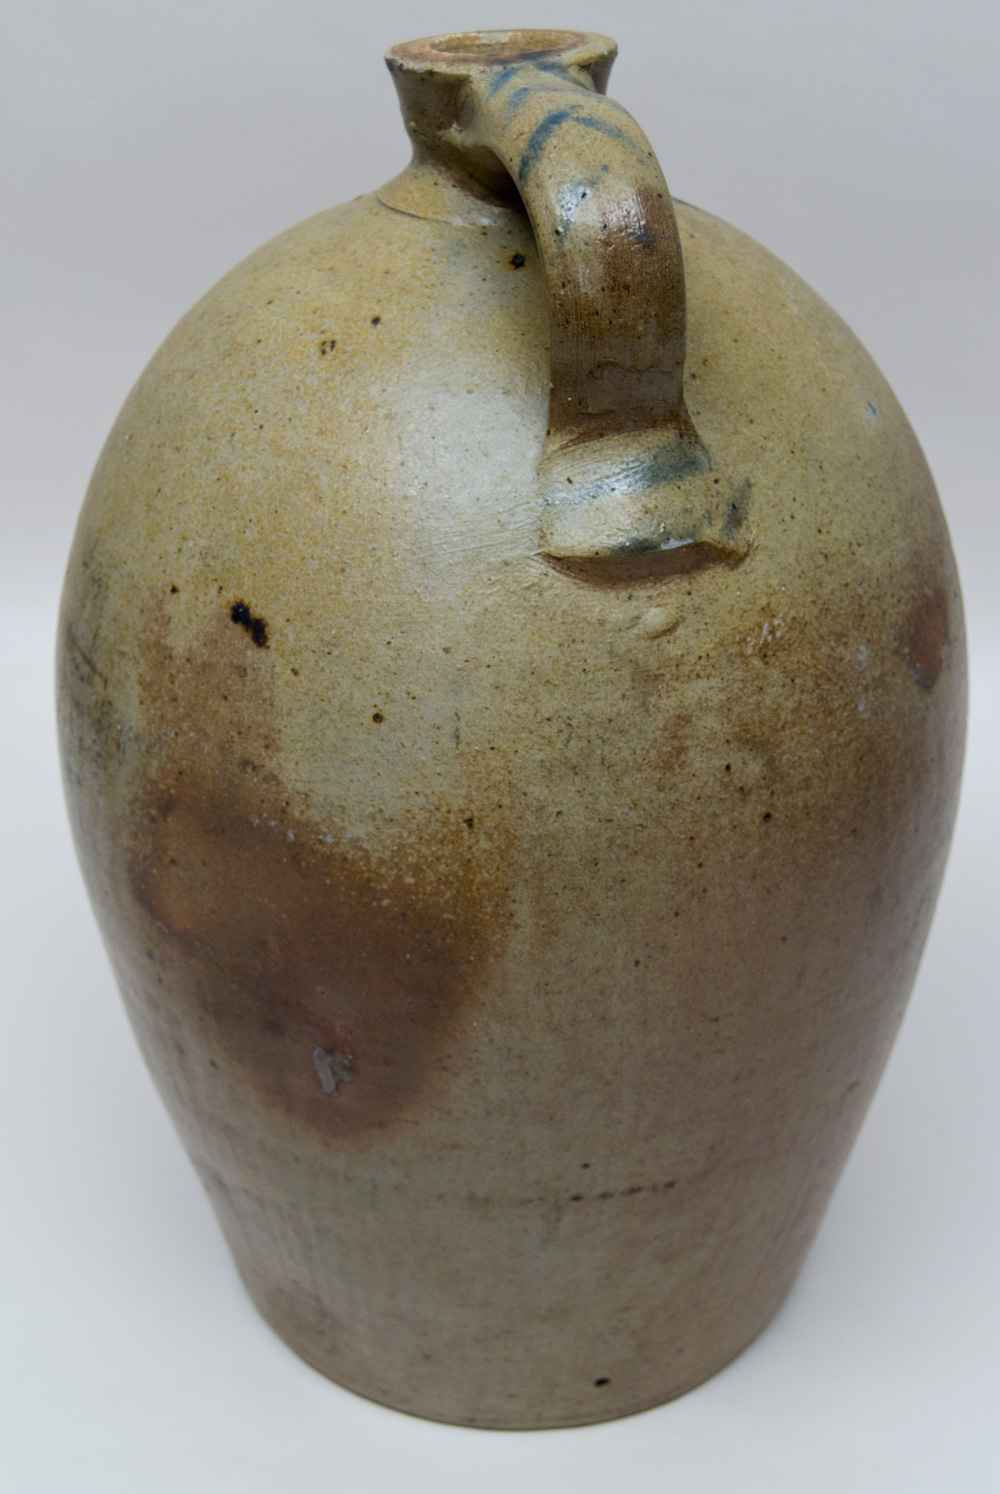 Large Antique Ovoid Stoneware Jug with Blue Freehand